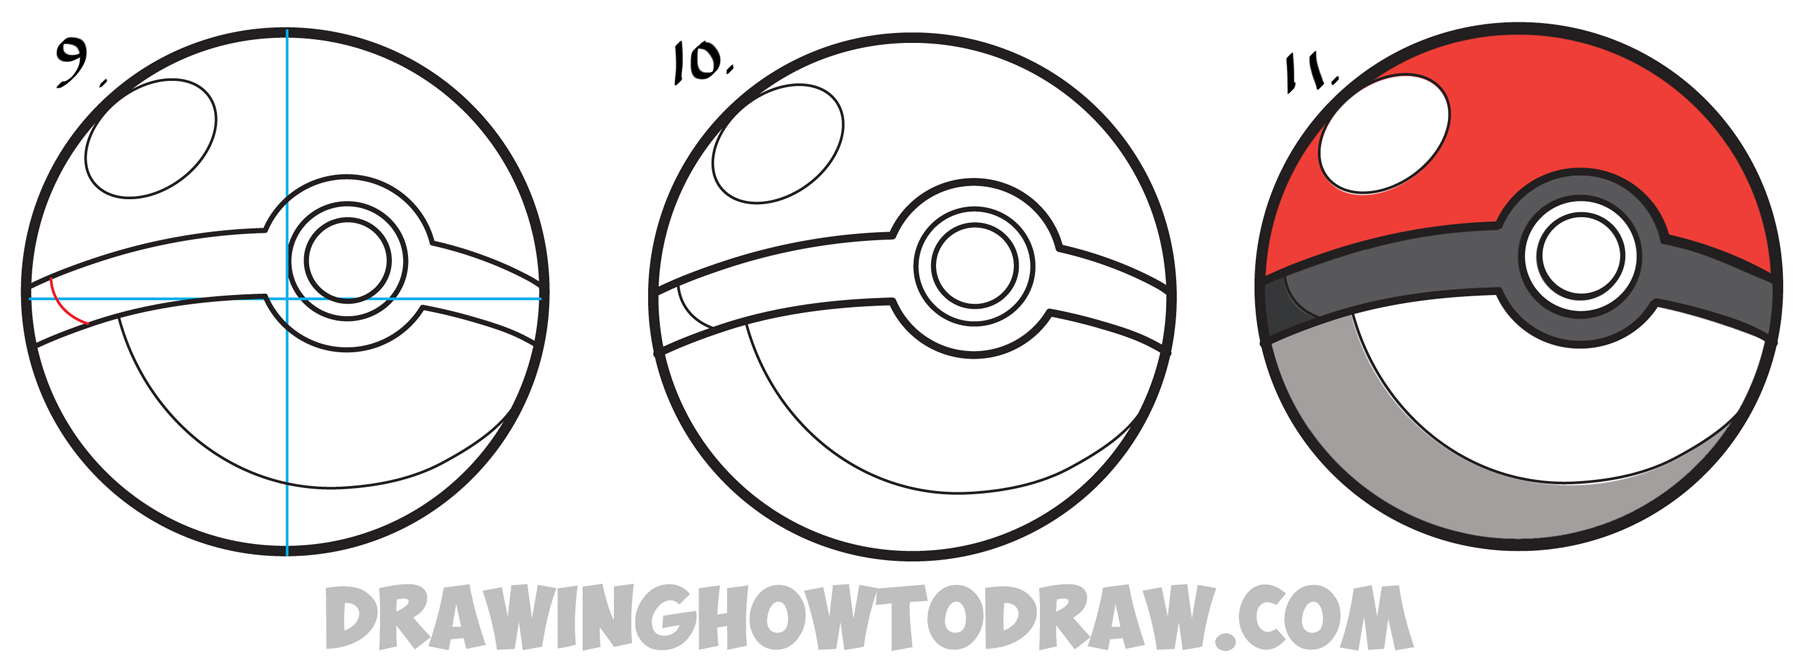 How to draw a pokemon 79